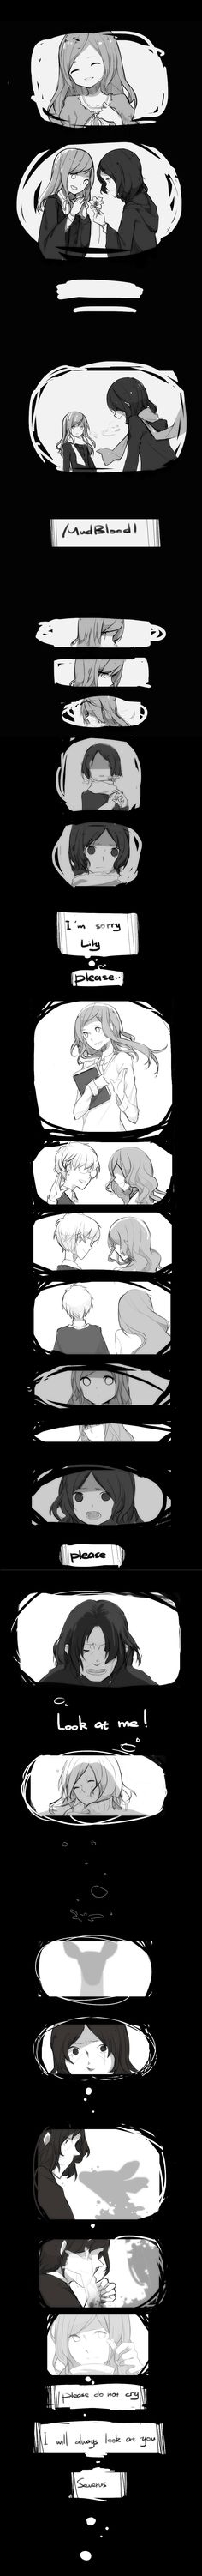 Severus Snape, Lily Evans